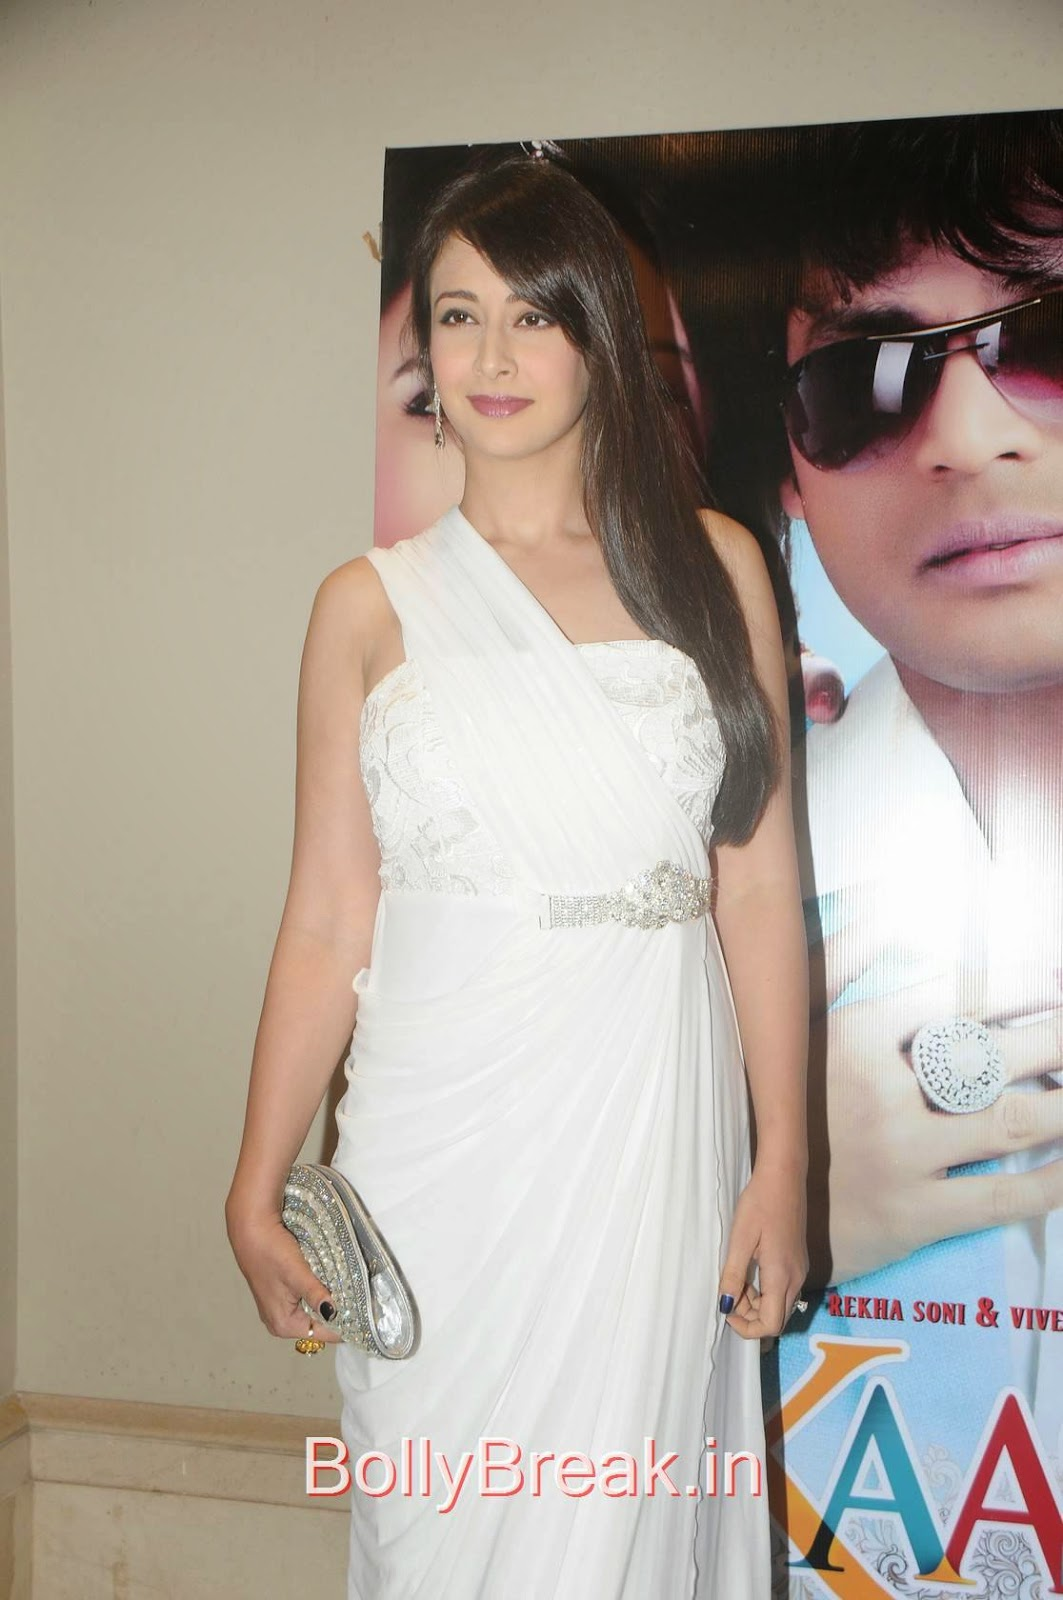 High Quality Preeti Jhangiani Pics, Preeti Jhangiani Hot Pics in white dress from Kaash Tum Hote Trailer Launch